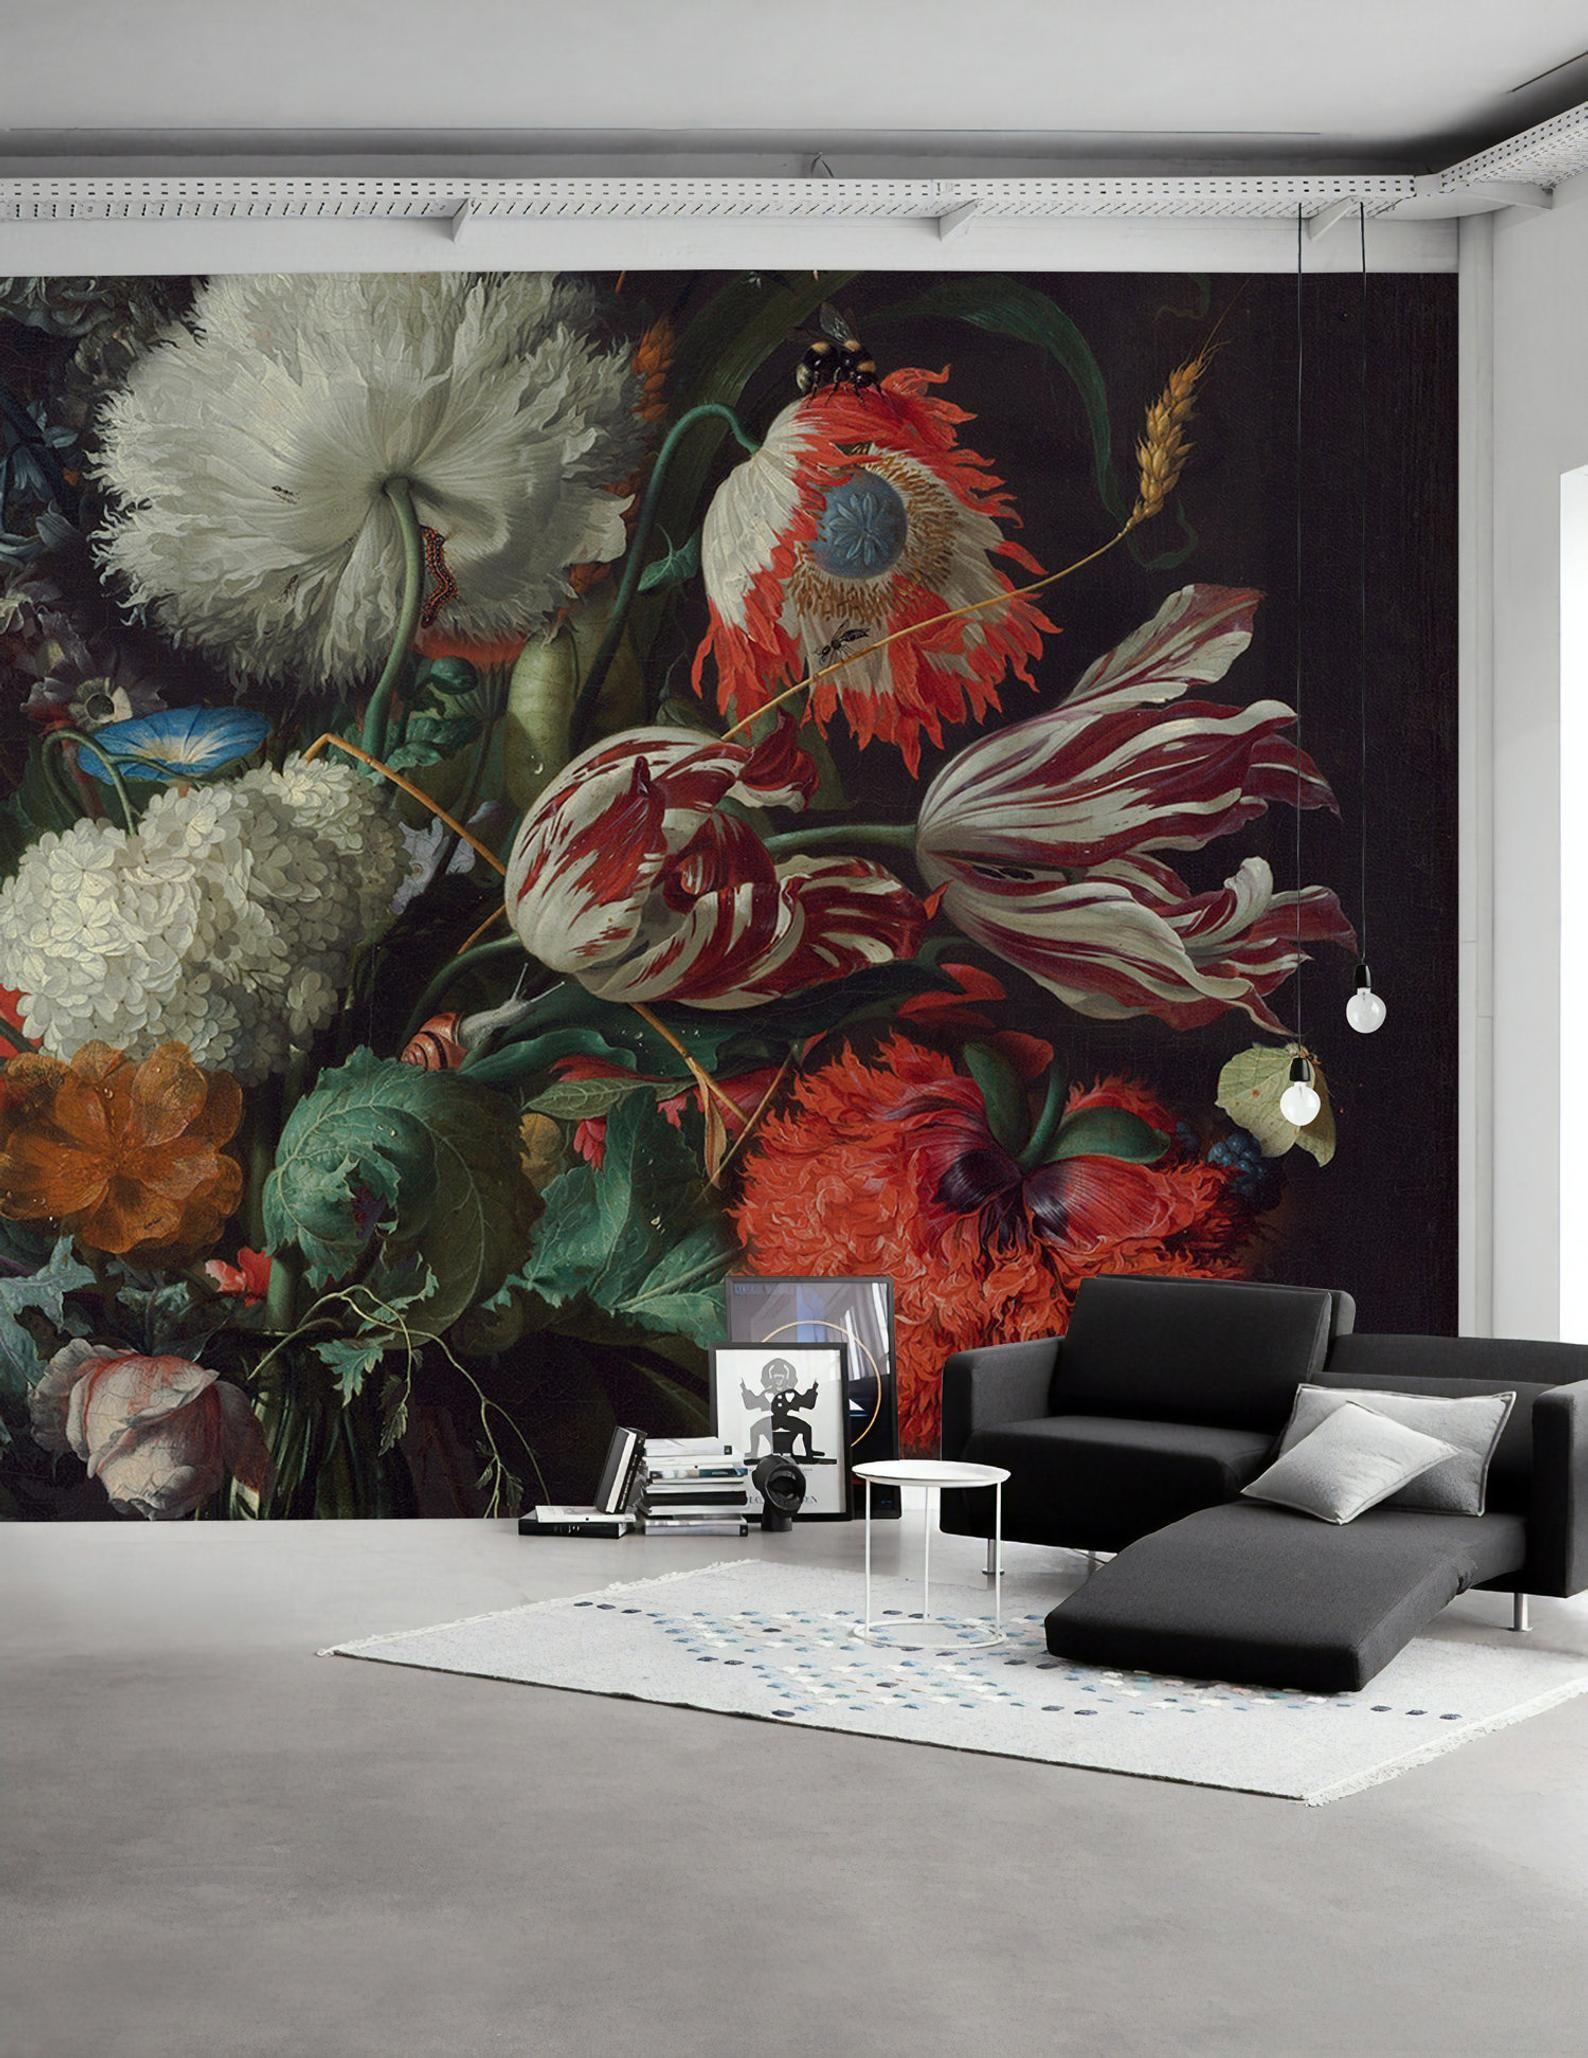 Dutch Dark Floral Wallpaper Tulip Flower Wall Mural Colorful Bouqet Wall Print Dutch Floral Wall Art Living Room Bedroom Flower Bedroom Floral Wallpaper Wall Murals